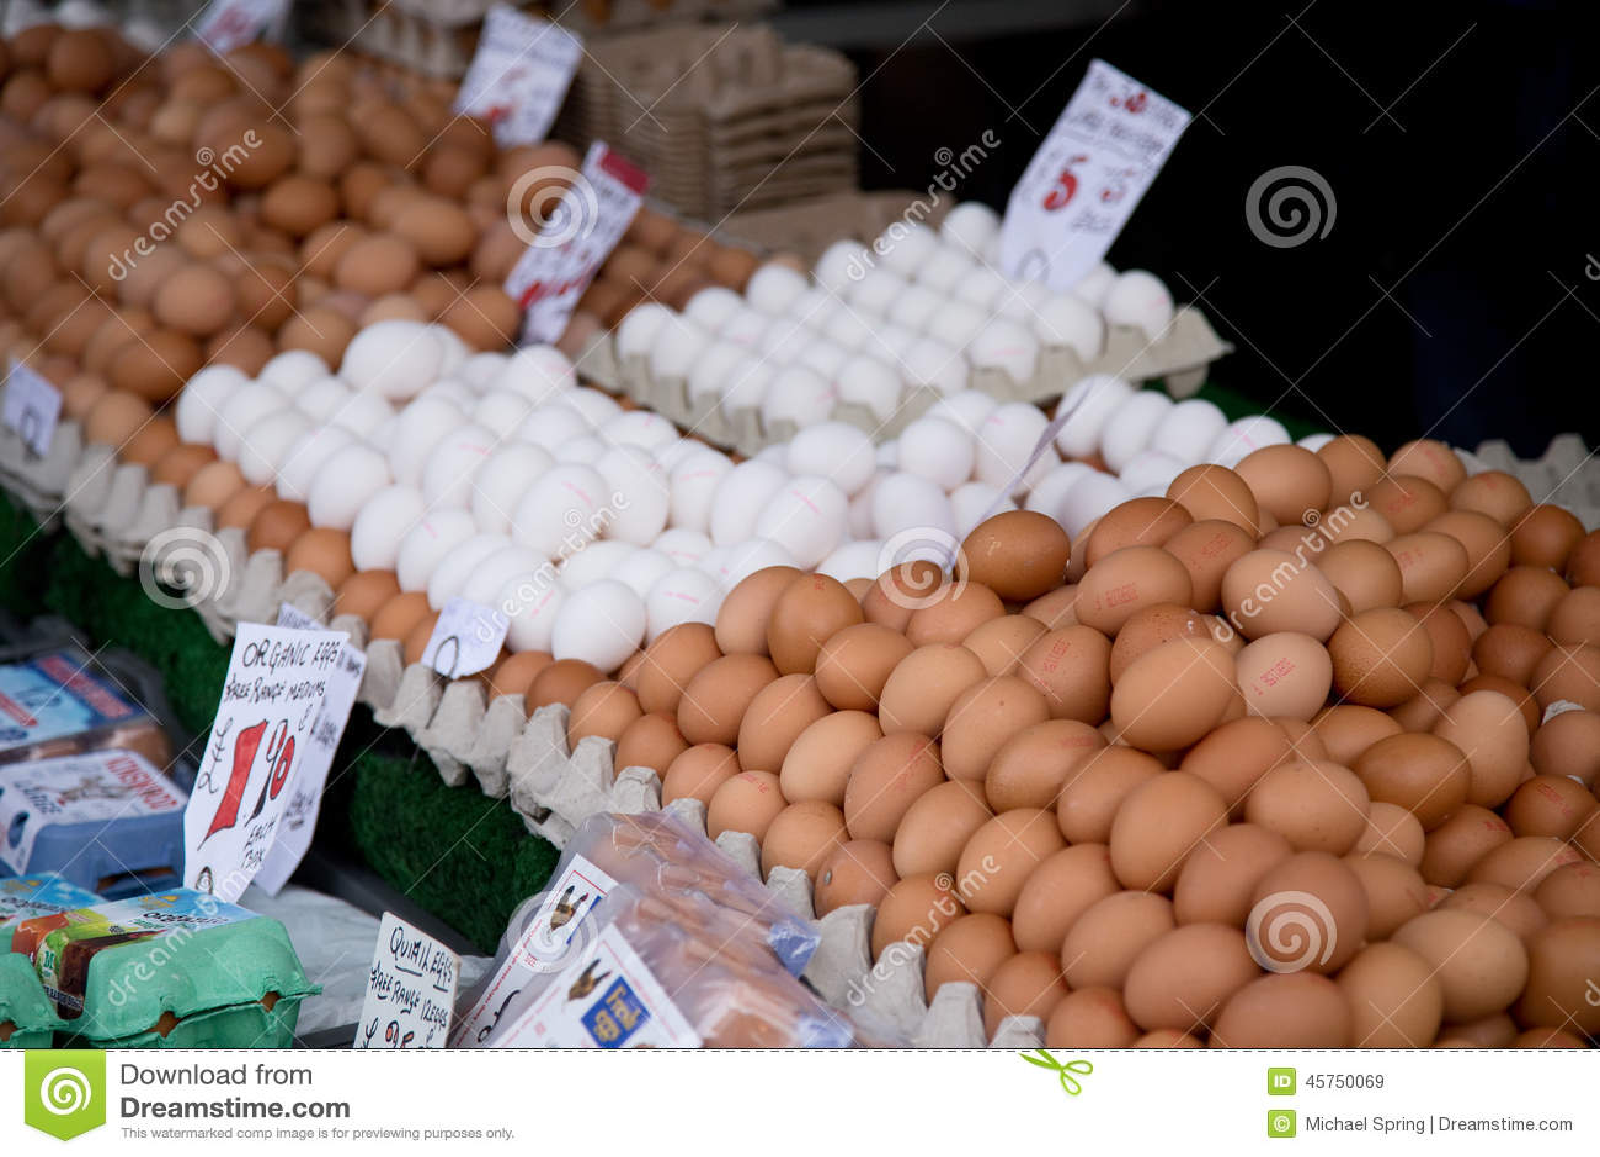 Mercato delle uova